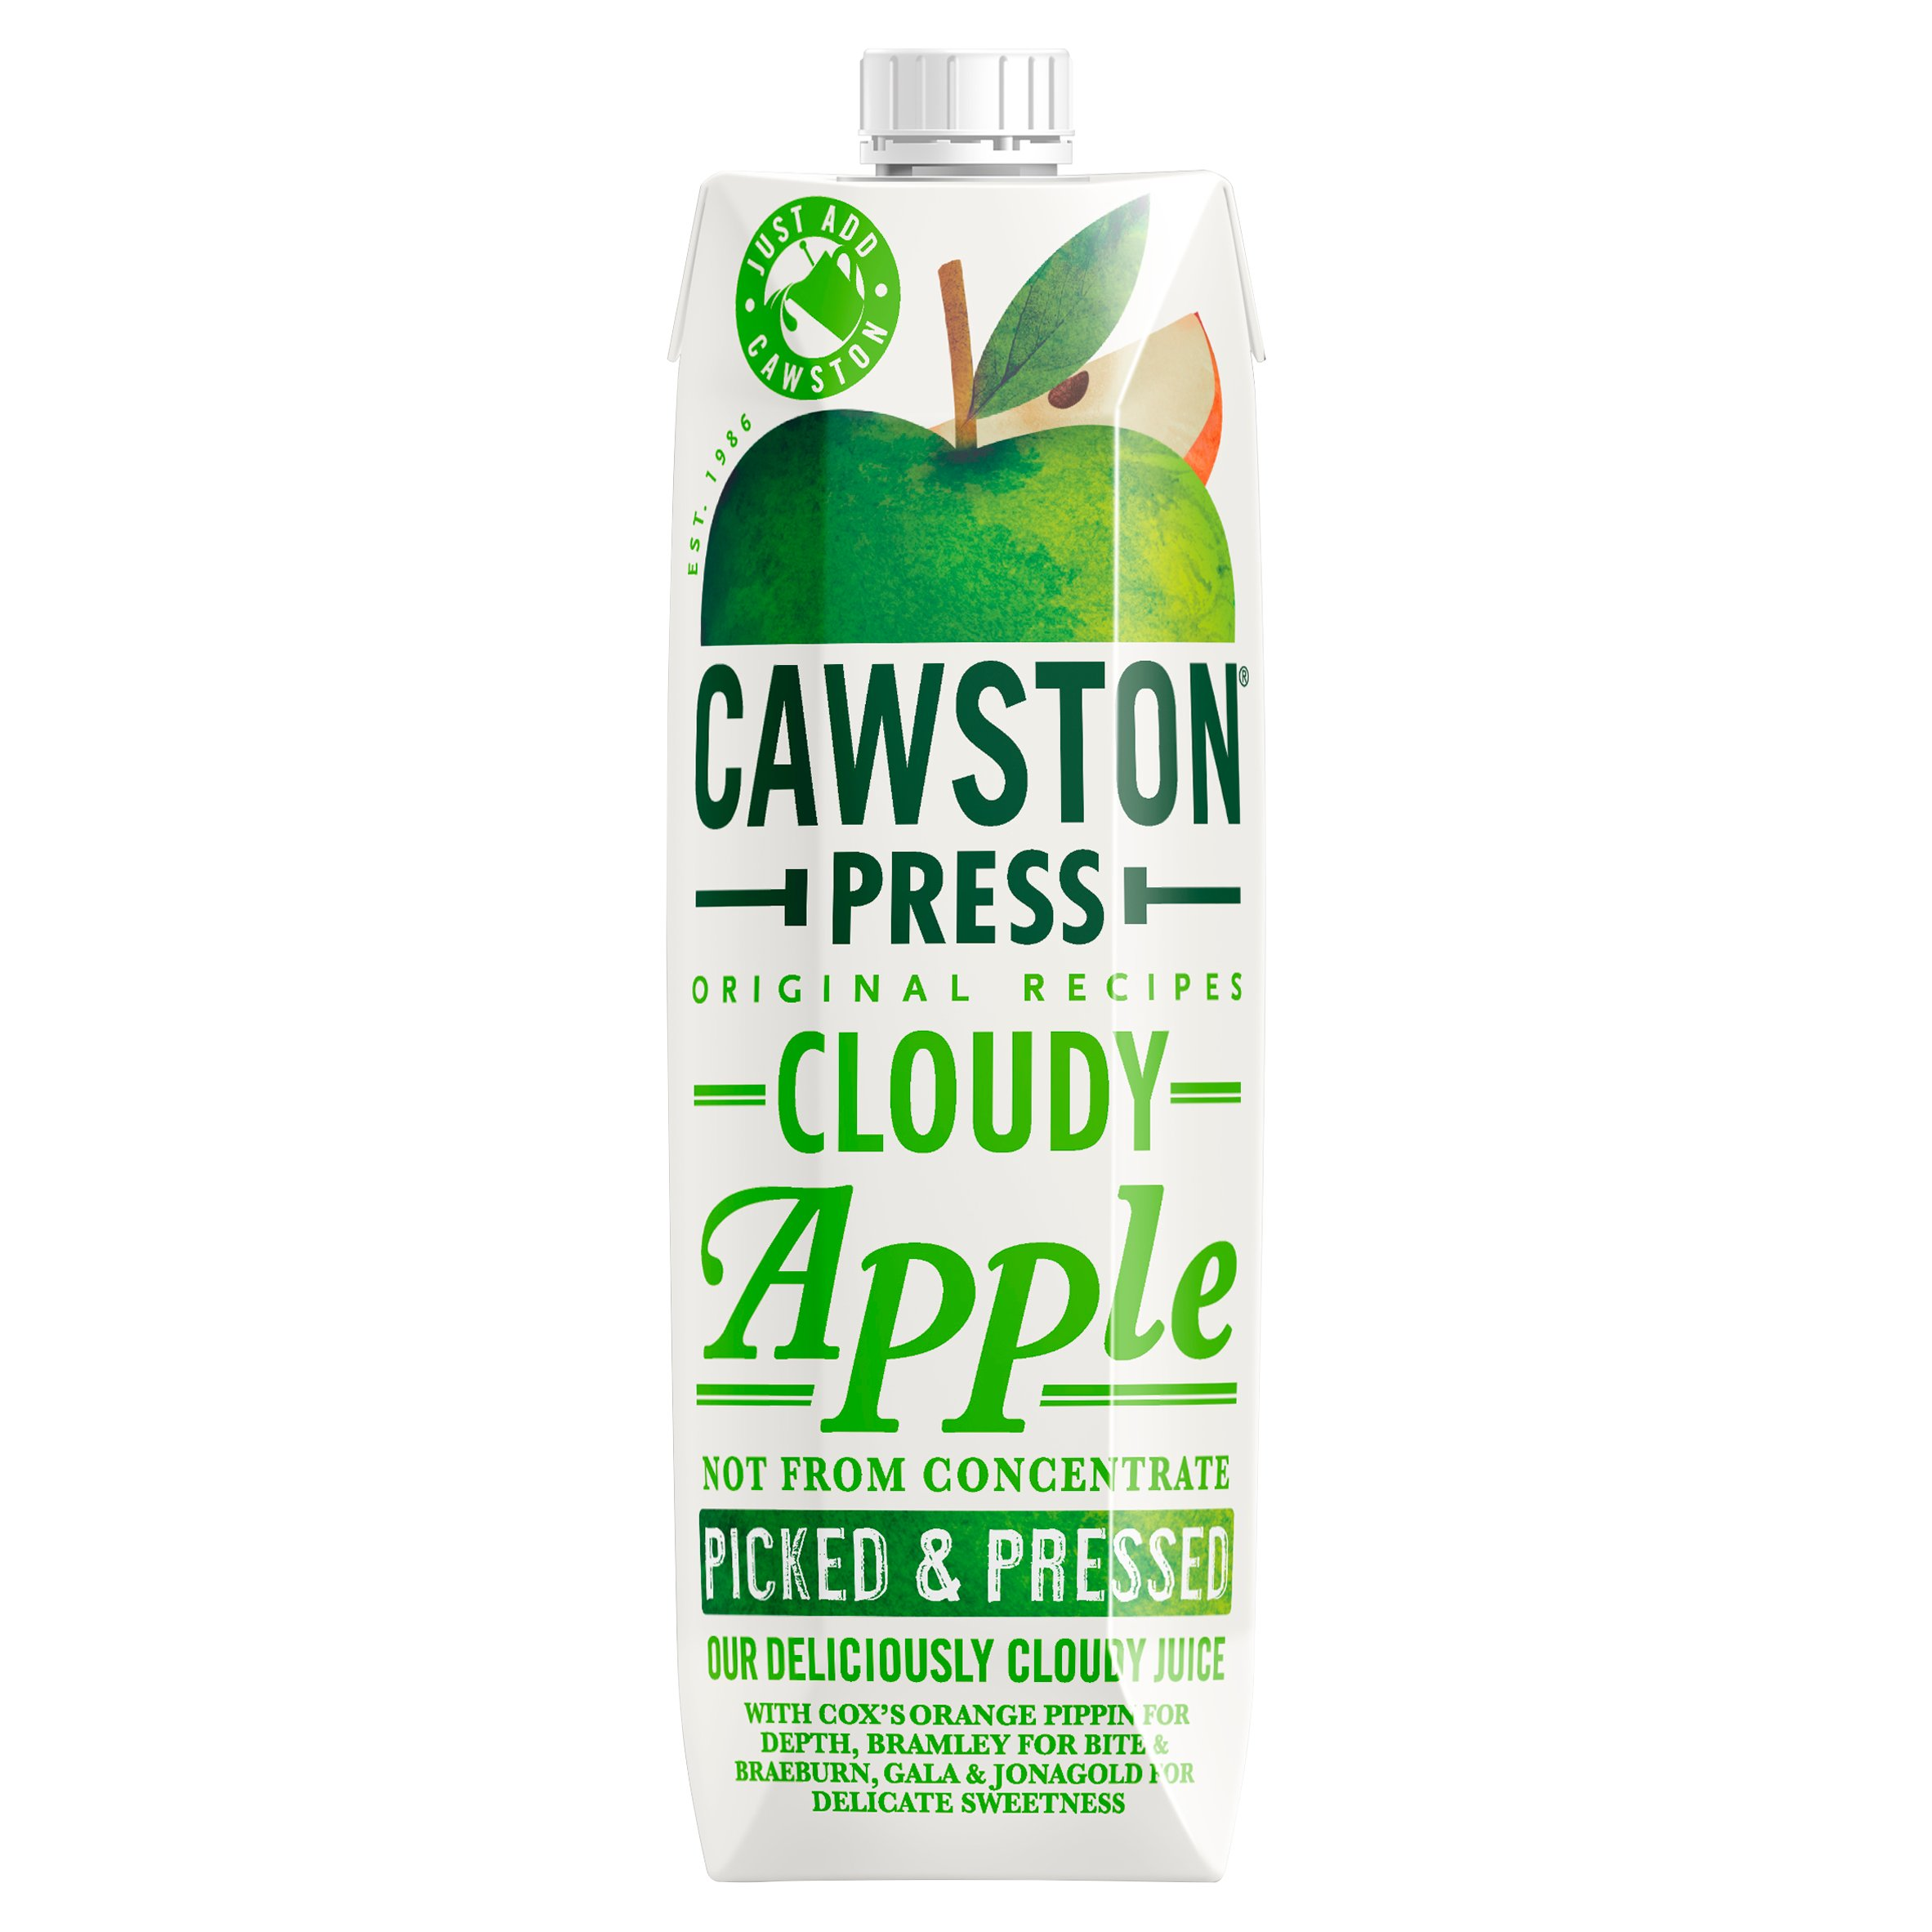 Cawston Press Cloudy Apple Juice 1Ltr